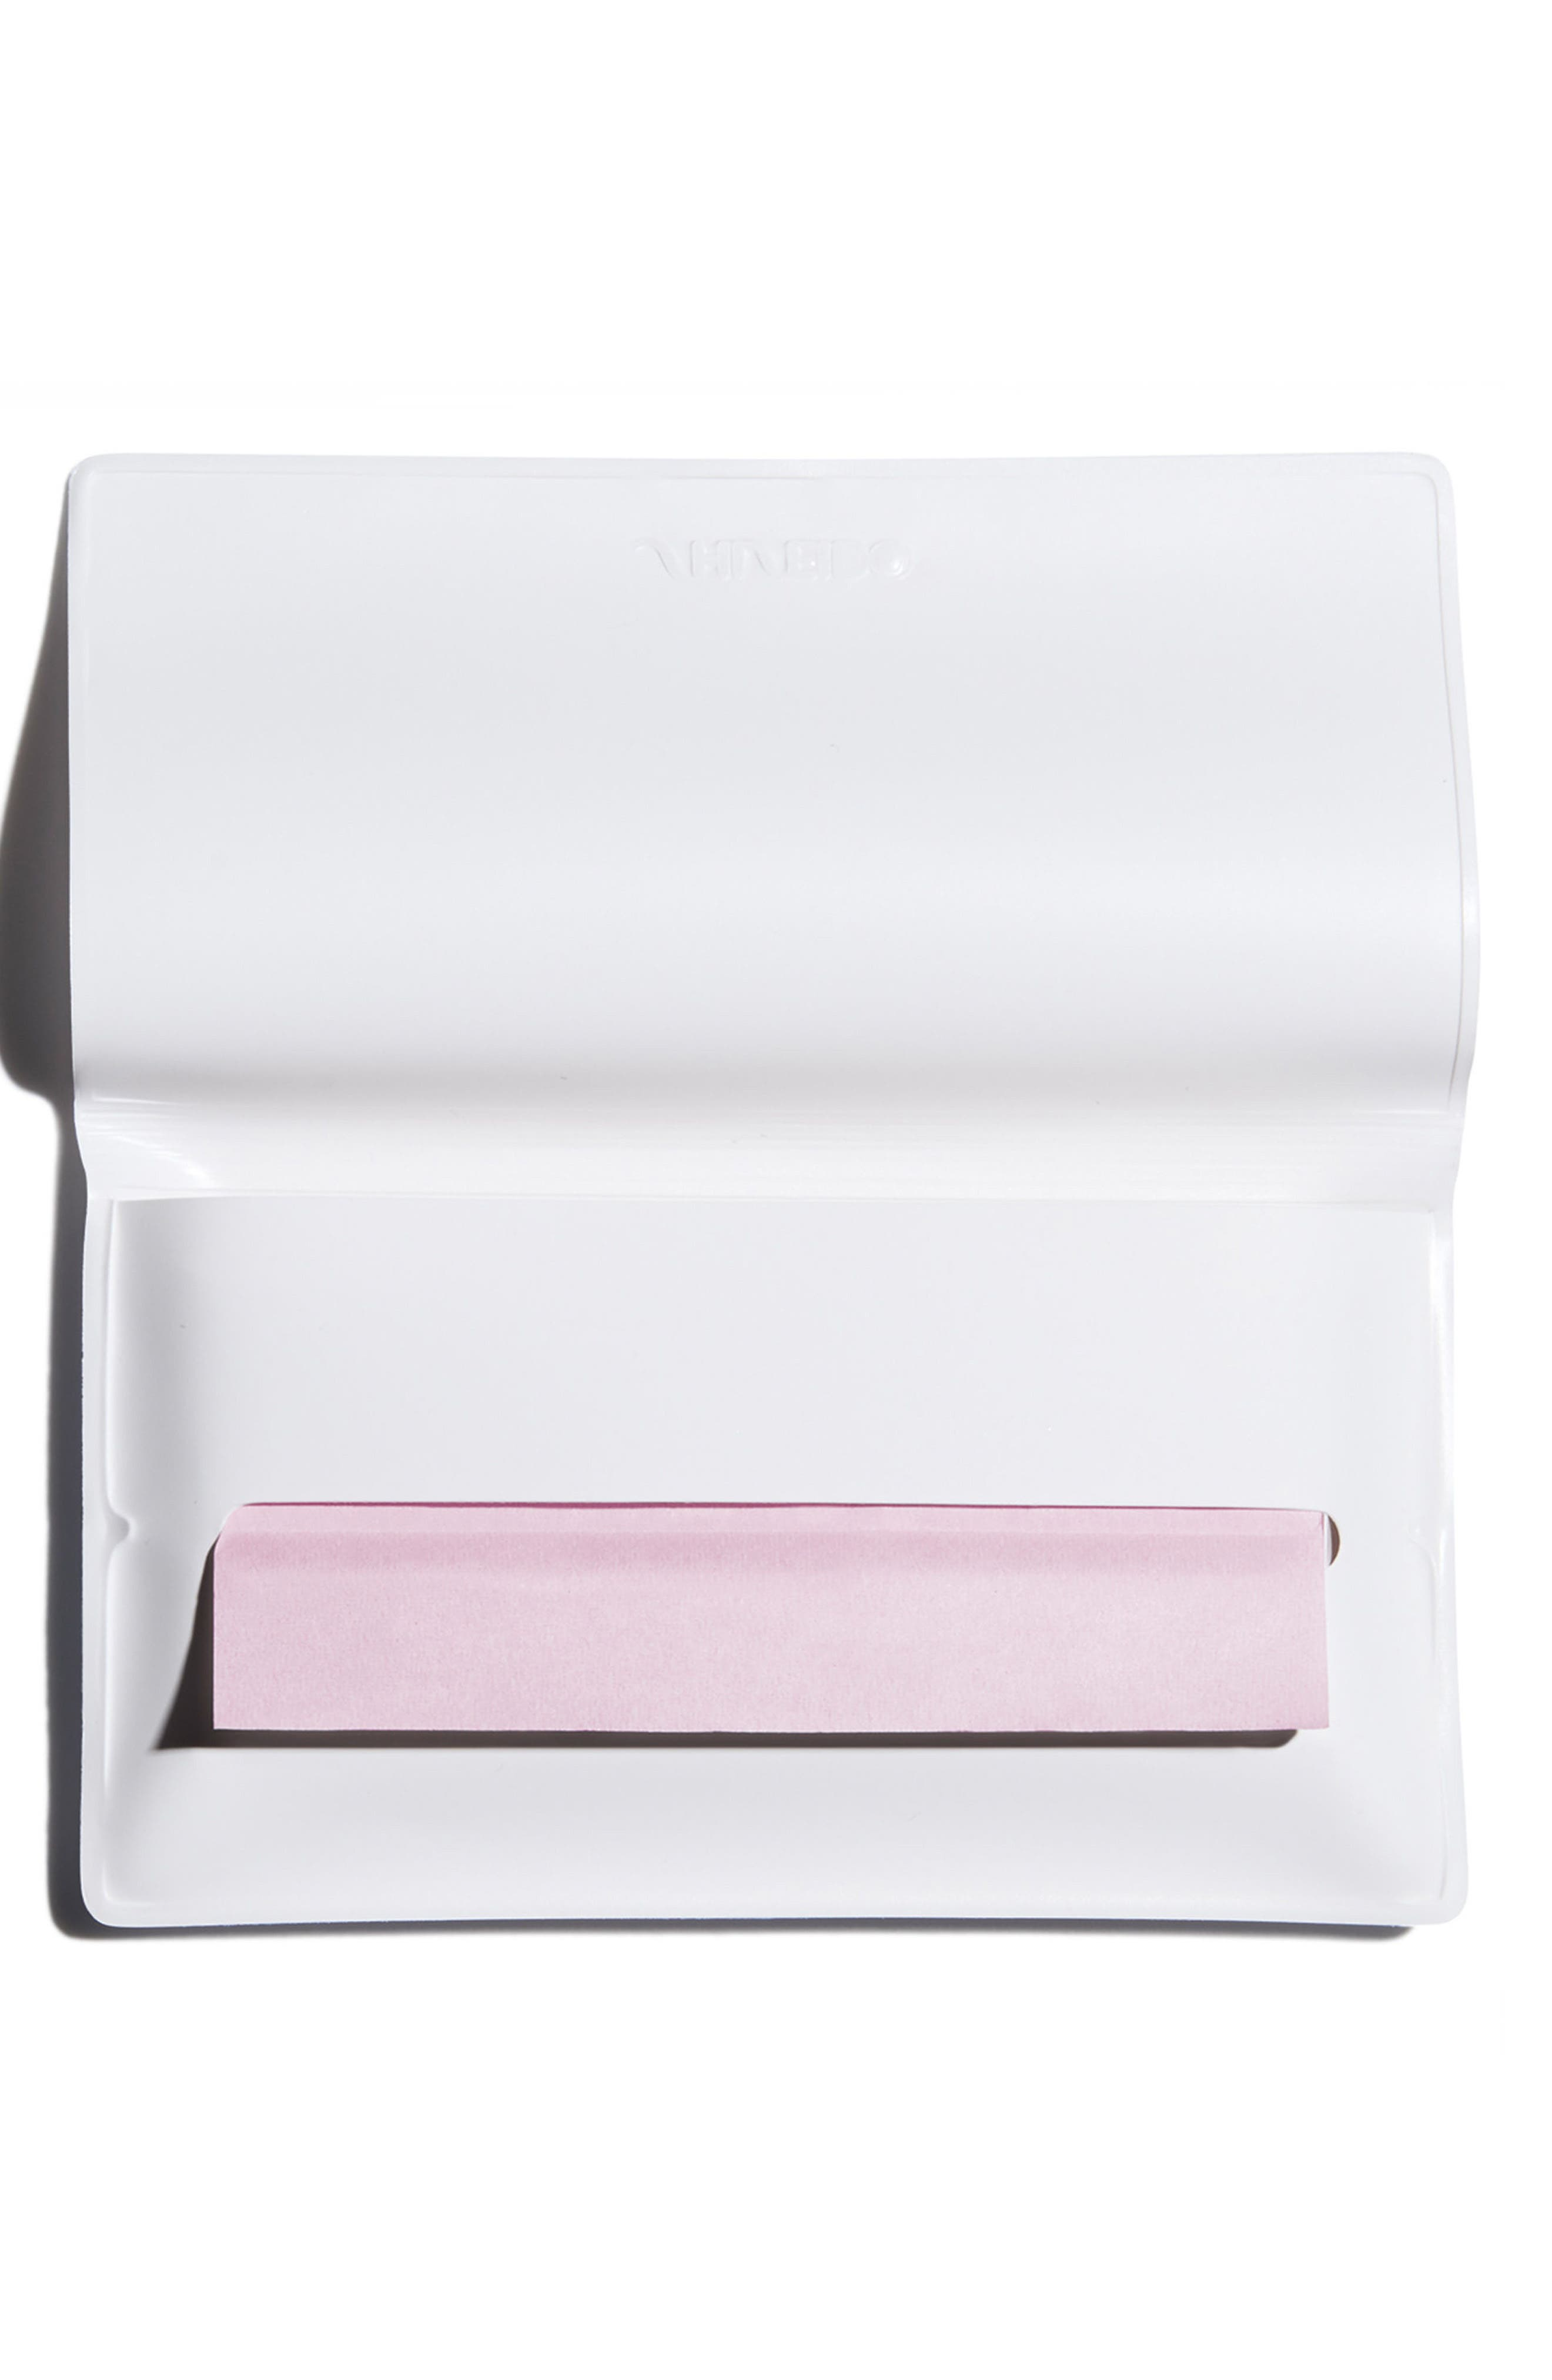 Main Image - Shiseido Oil-Control Blotting Paper